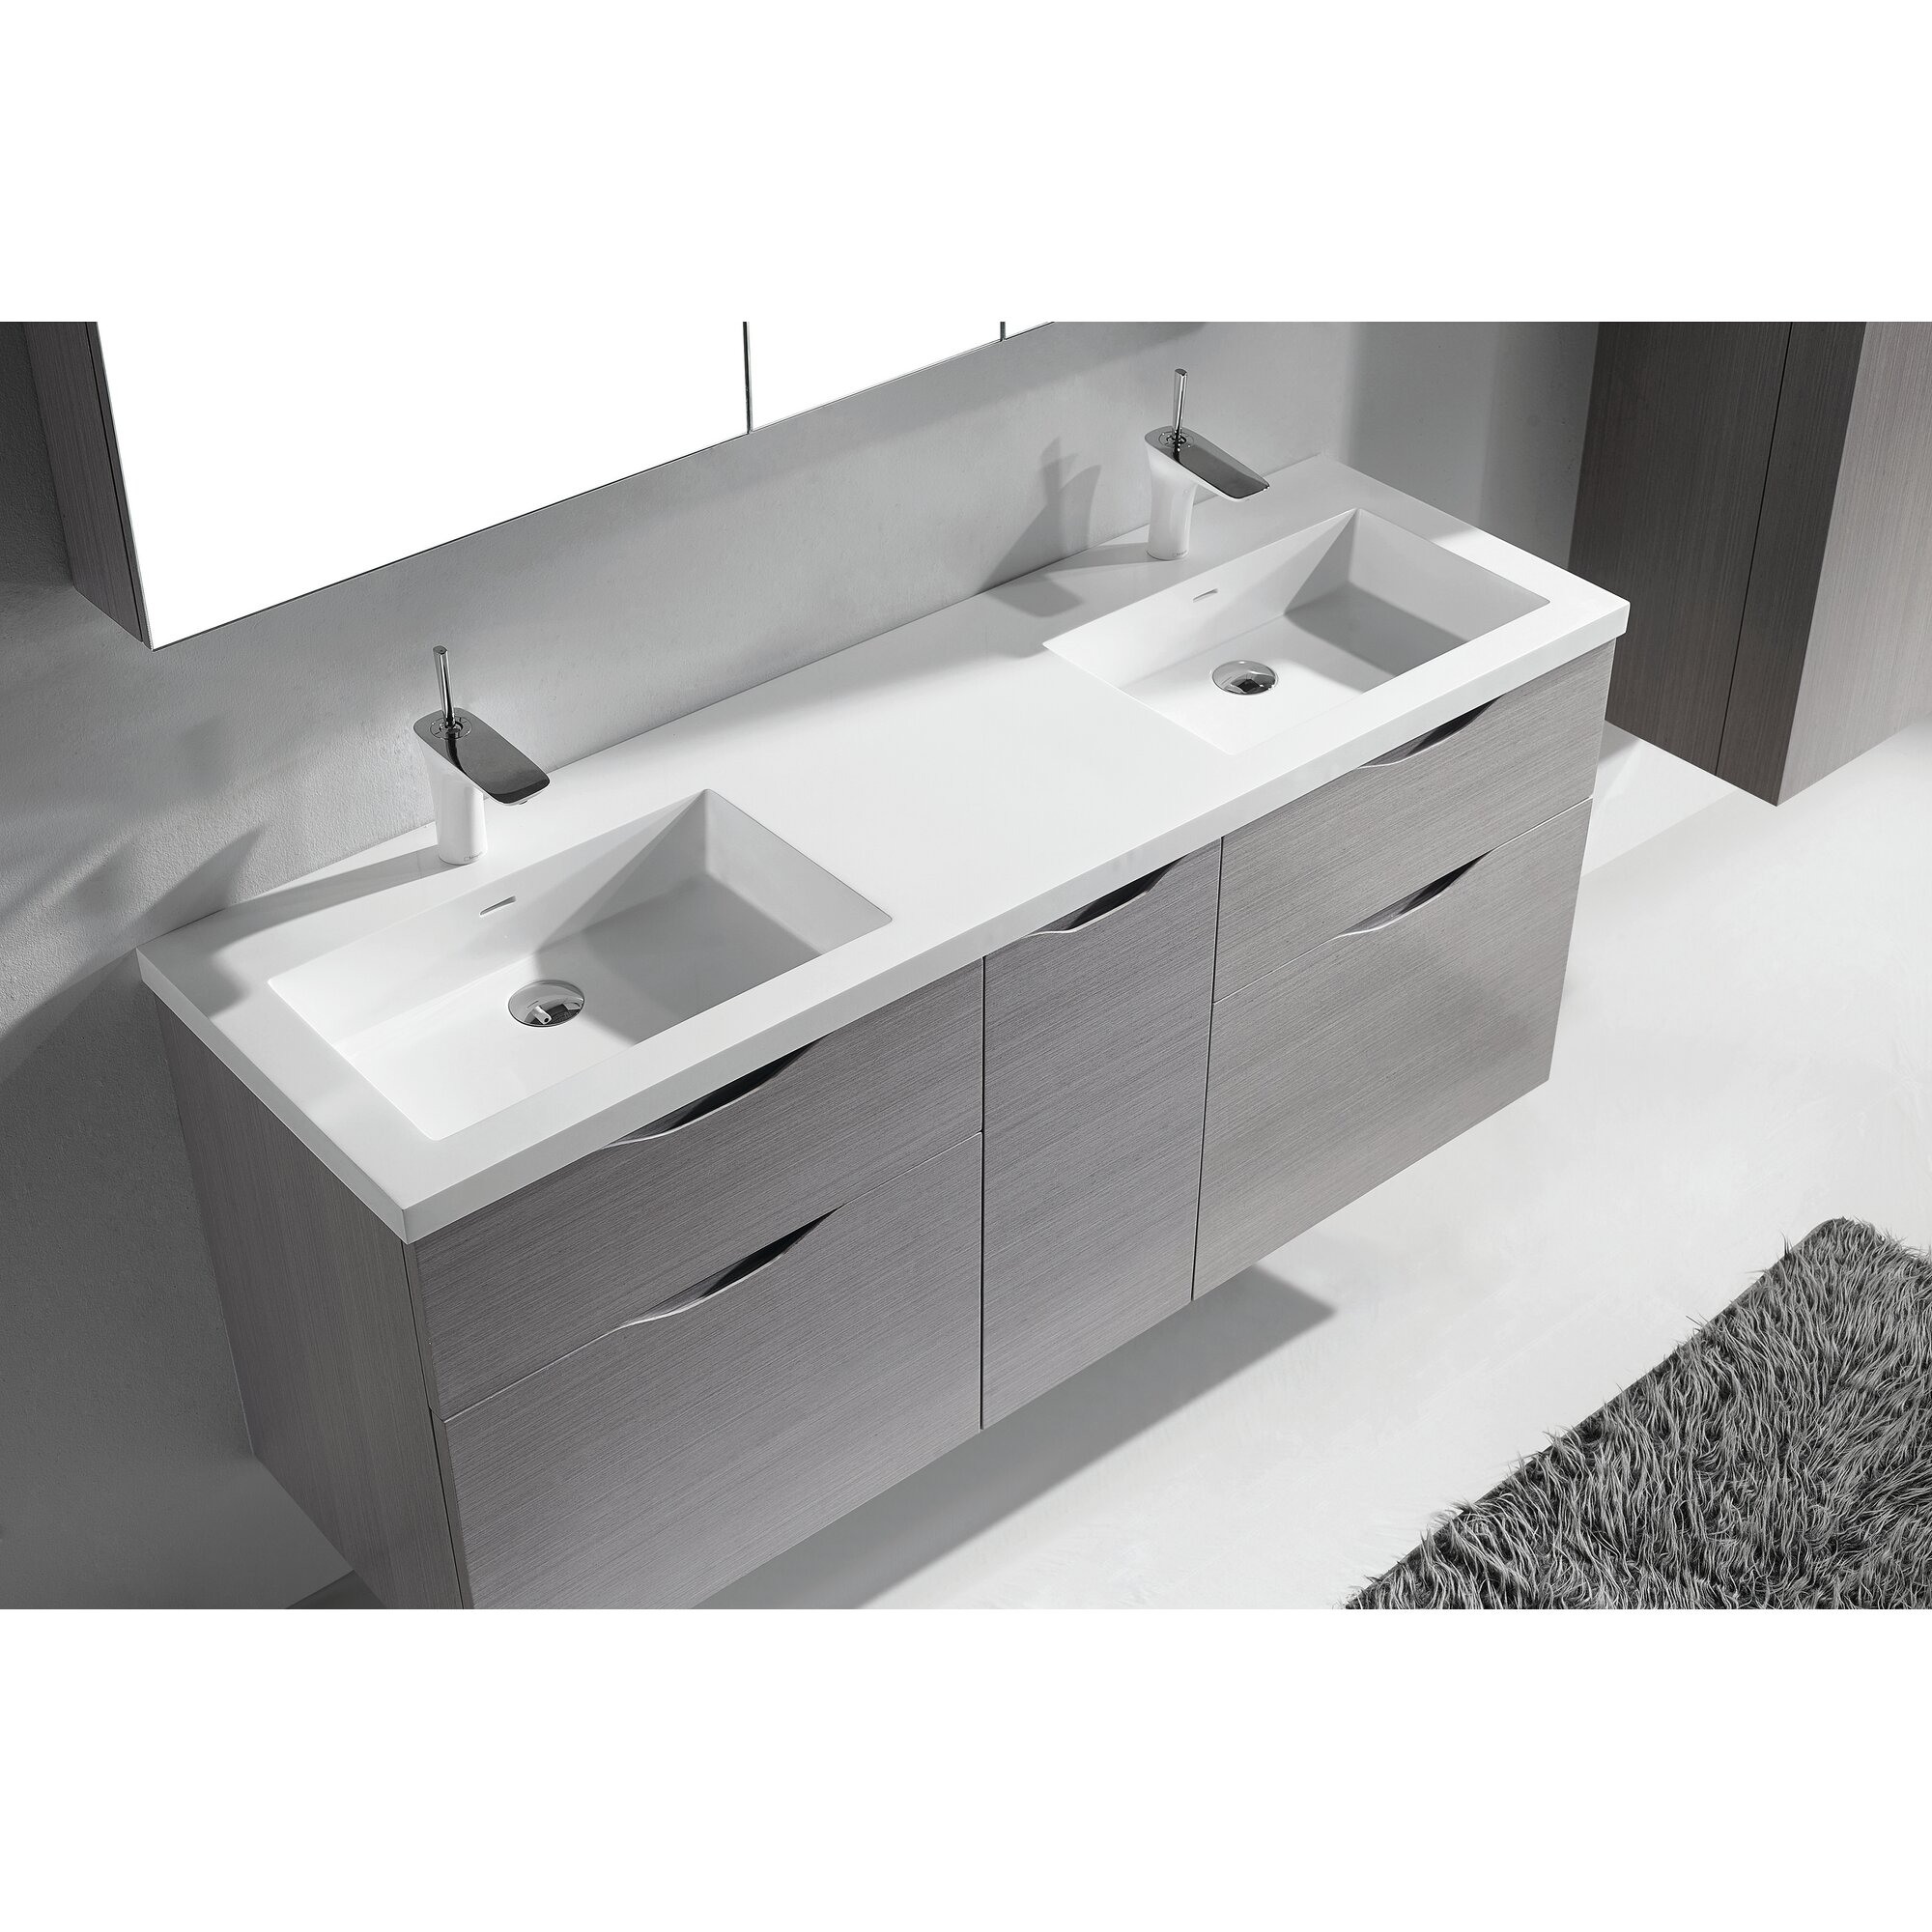 Double bathroom vanity - Bolano 60 Double Bathroom Vanity Set